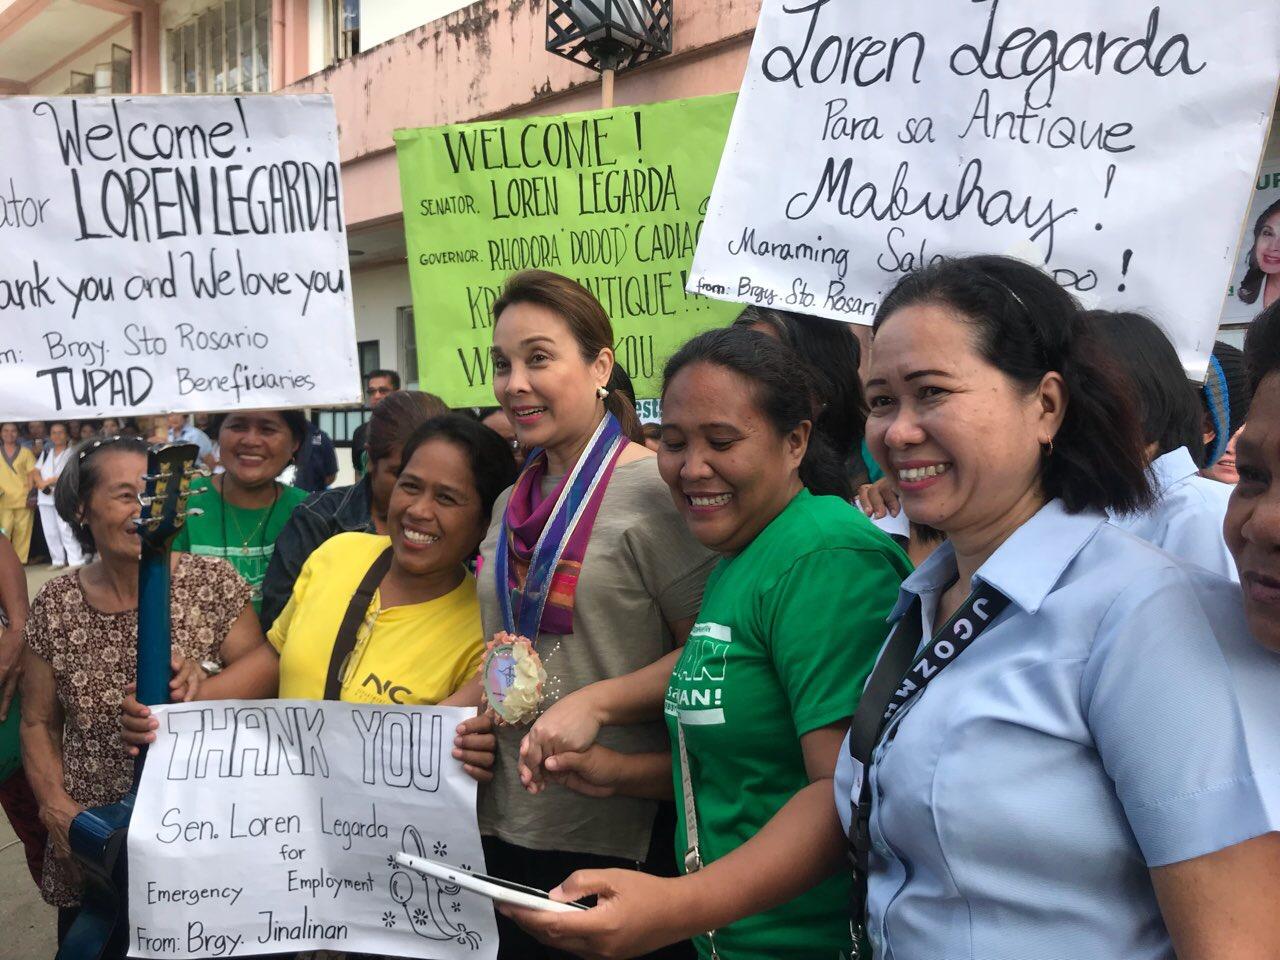 Senator Legarda Visits Antique (Day 2 – January 11, 2018)